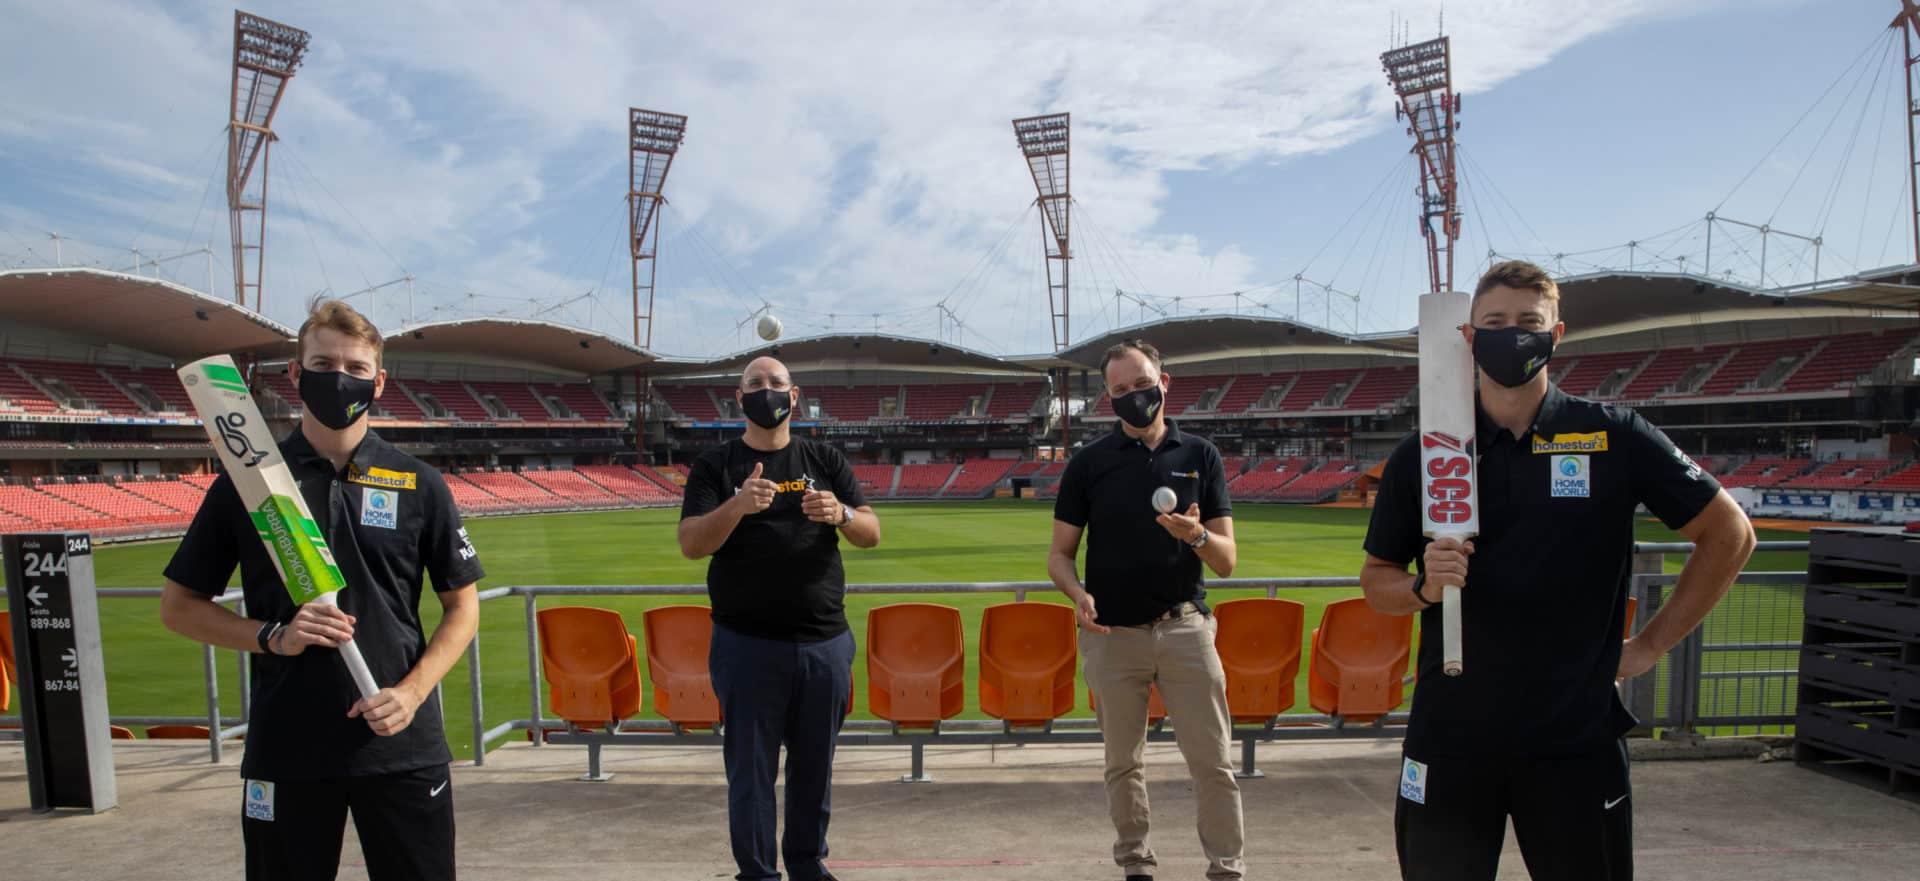 Homestar Finance announced as principal sponsor of Sydney Thunder BBL